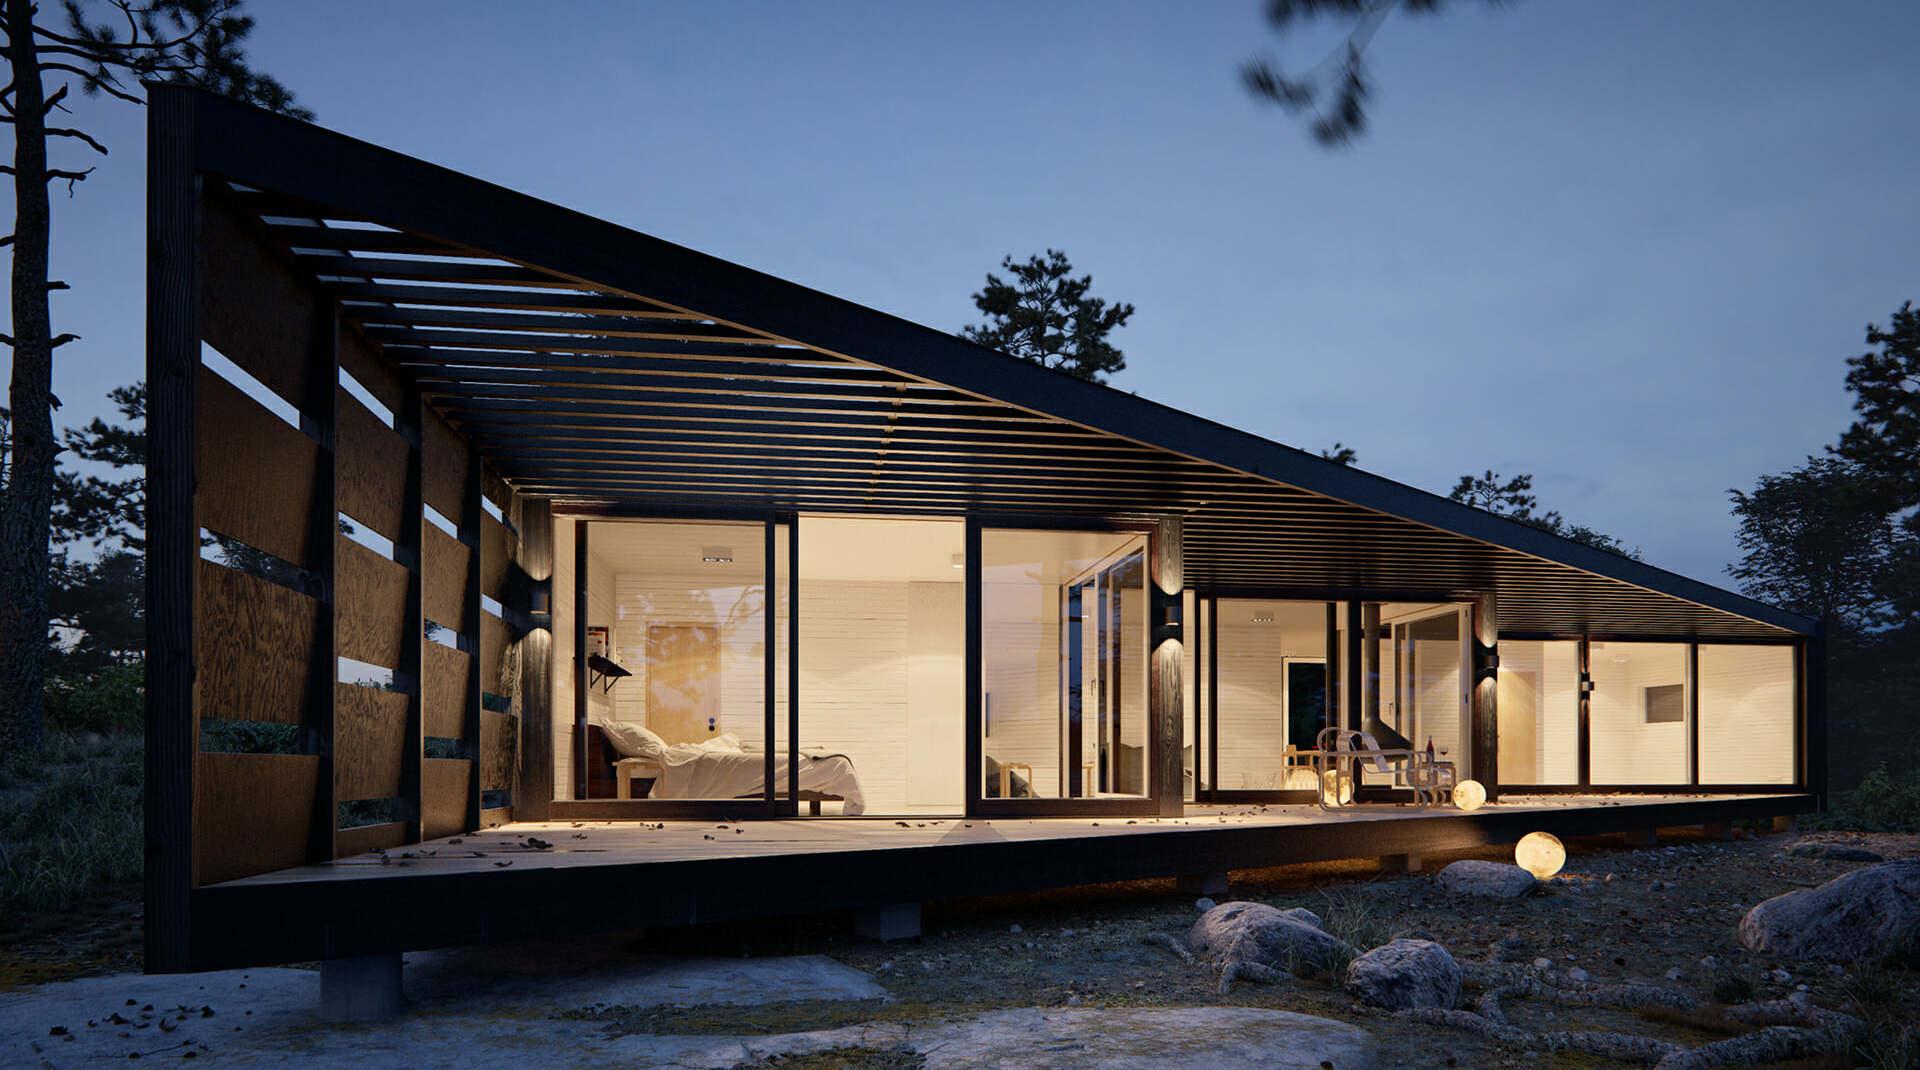 Radek ignaciuk archipelago house architecture vray 3ds max 01 feature